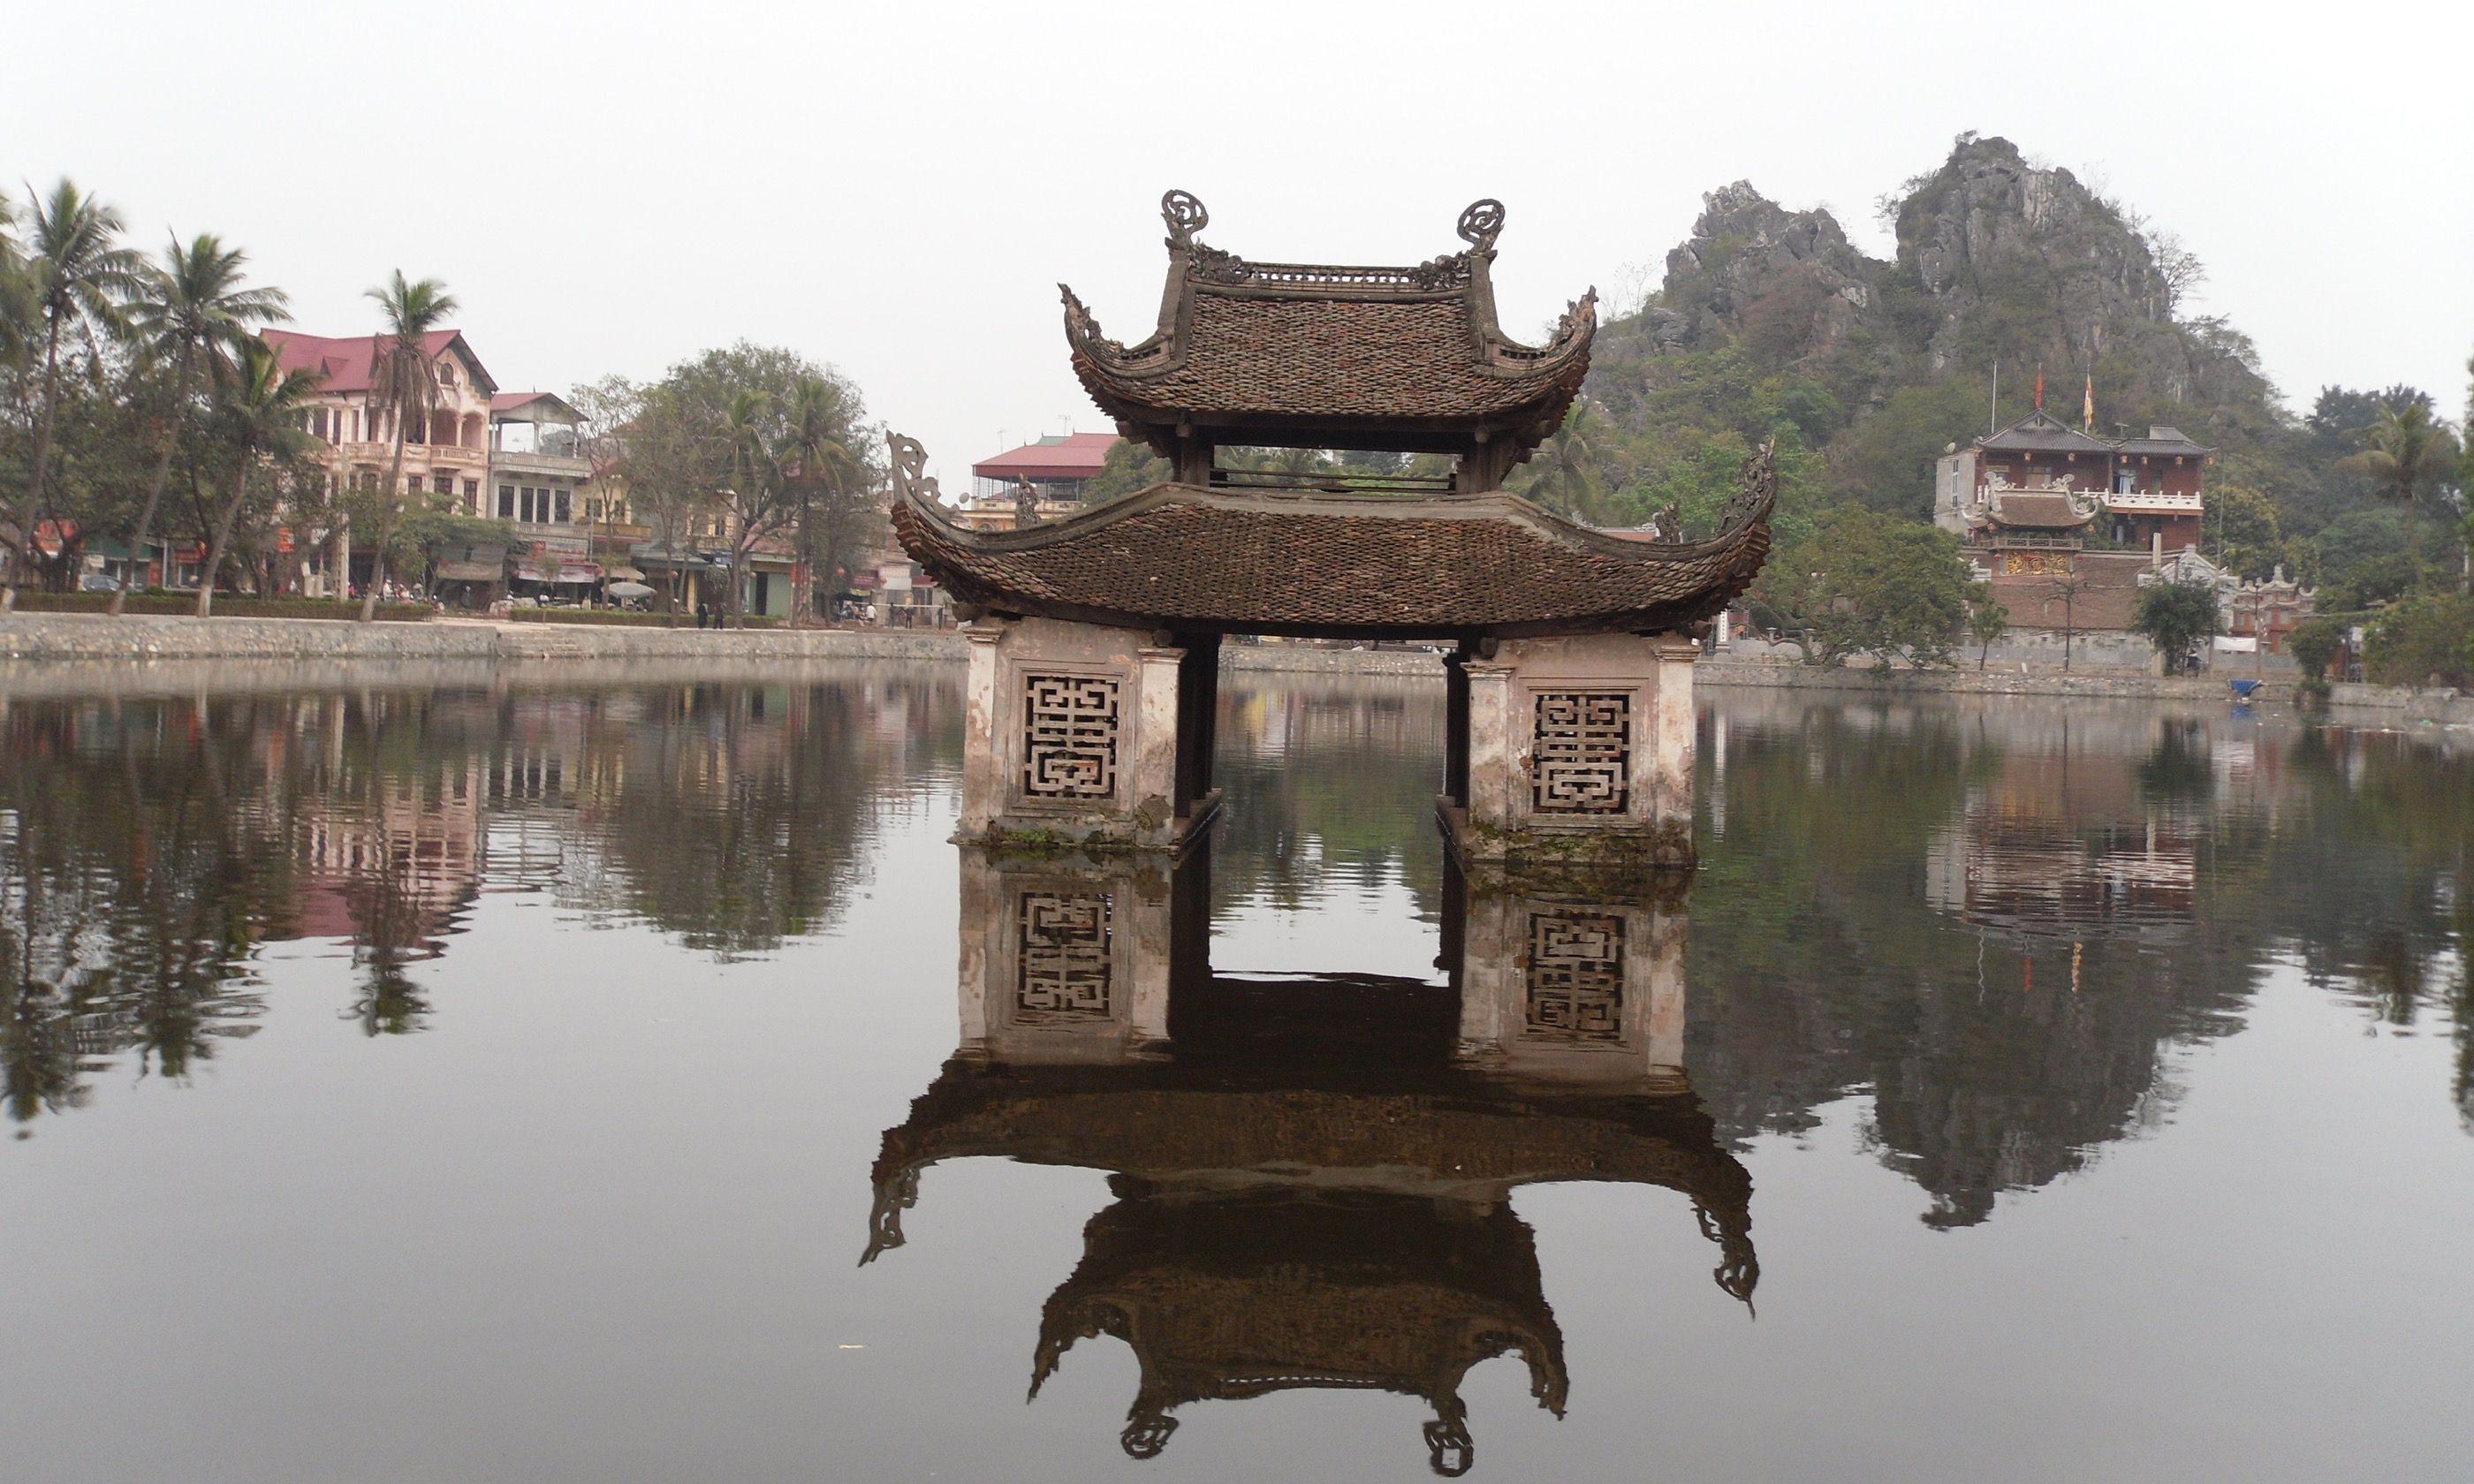 Thay Pagoda (Dreamstime)